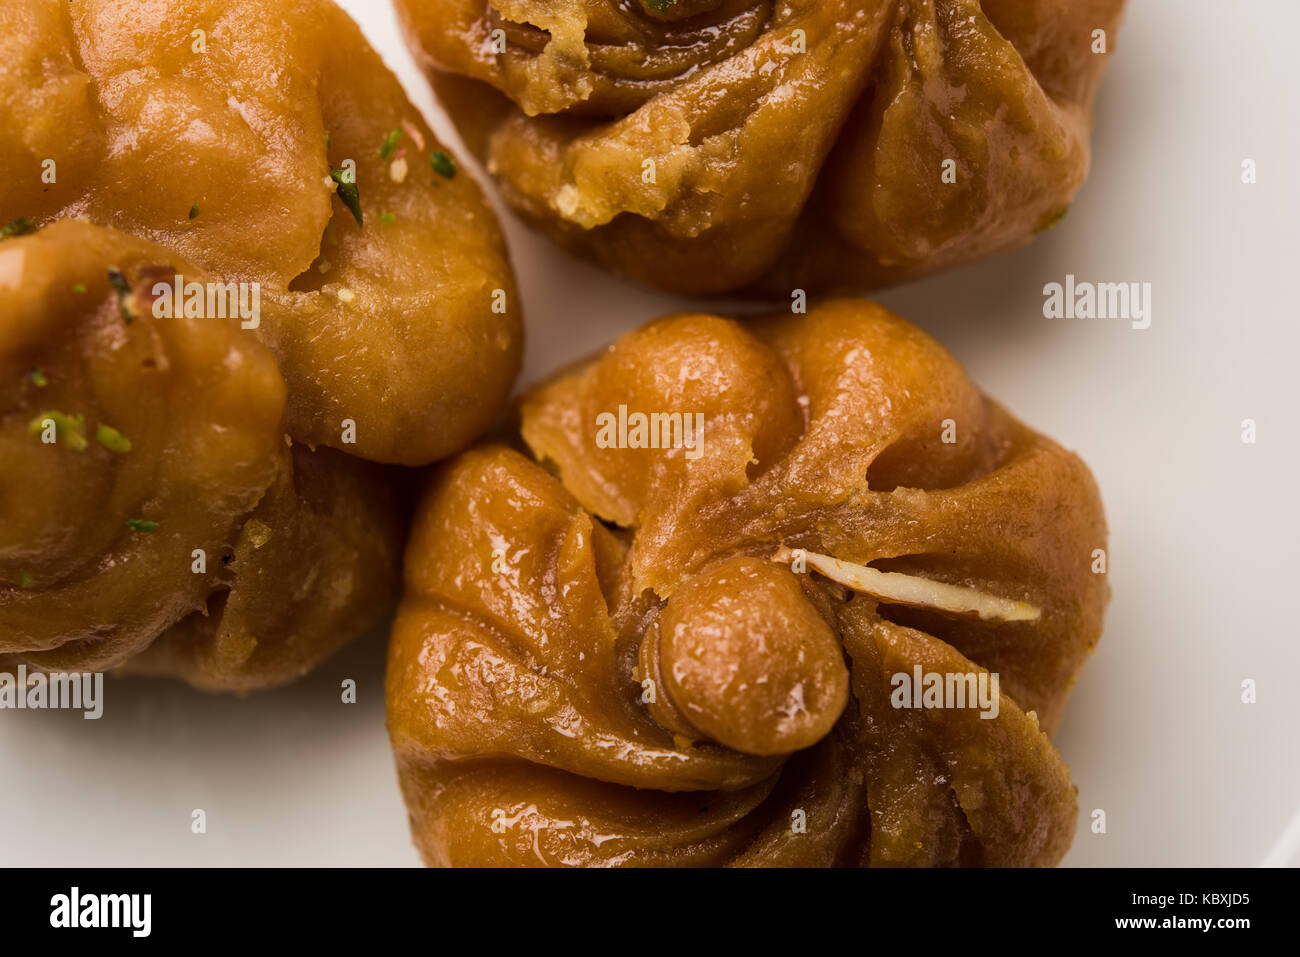 Stock photo of Balushahi, Indian sweet food made up of Maida floor, oil and sugar, selective focus - Stock Image